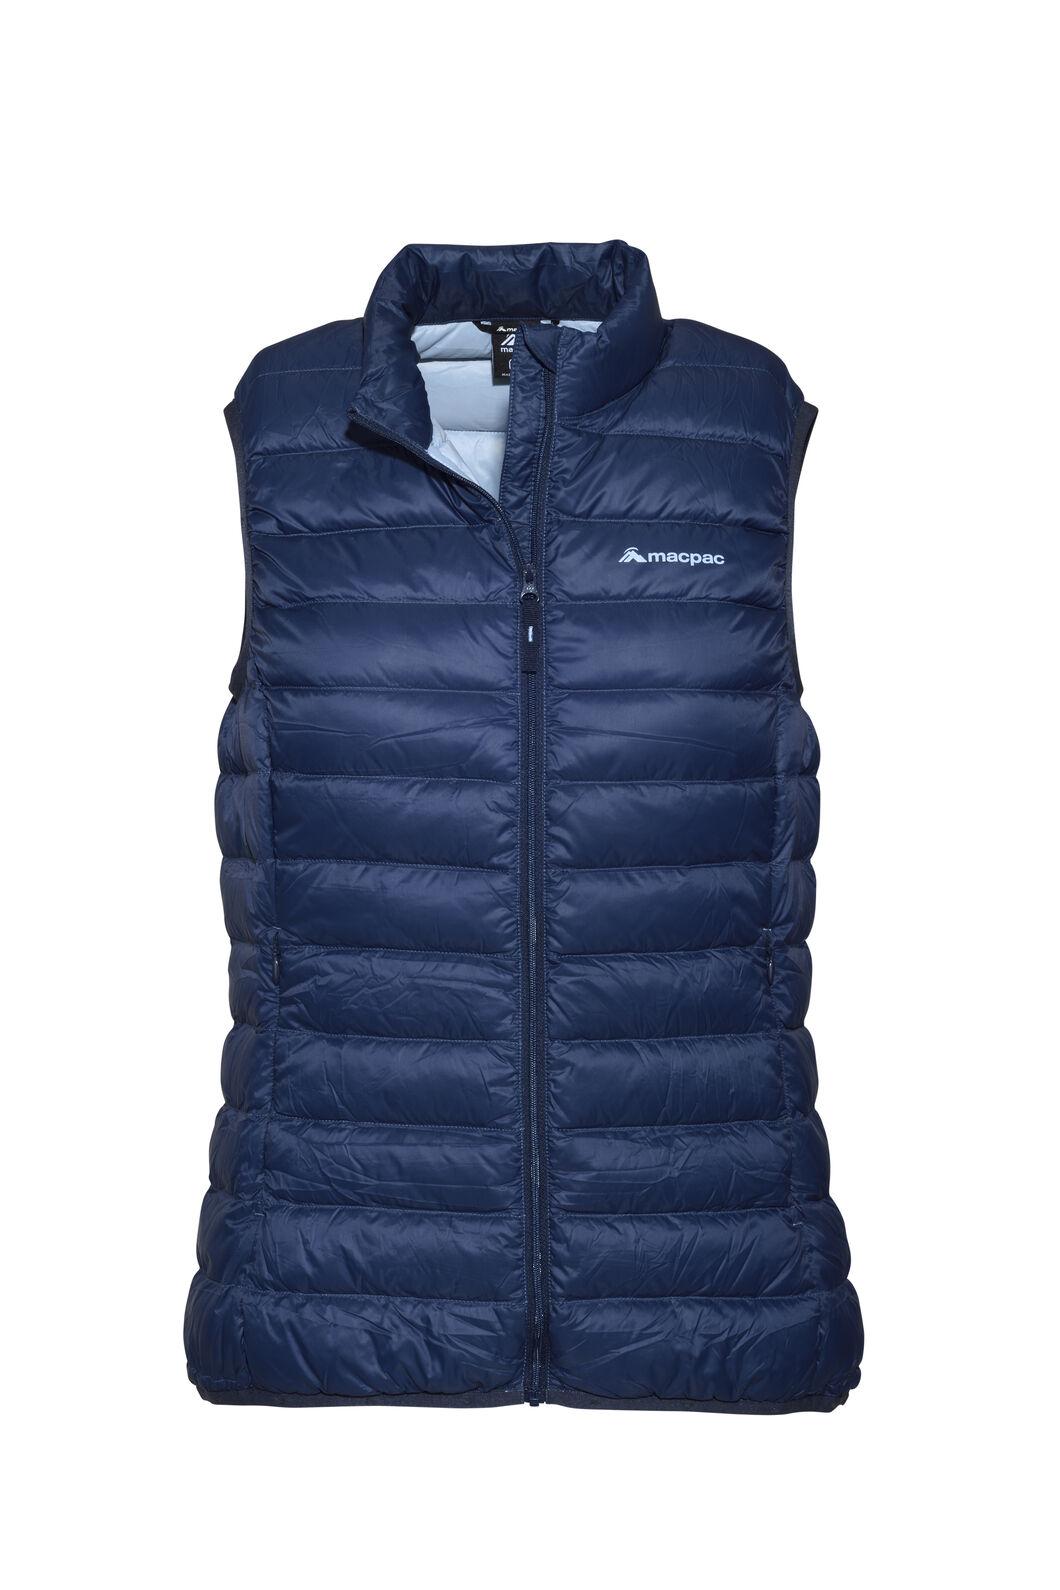 Macpac Uber Light Down Vest - Women's, Black Iris/Blue Fog, hi-res